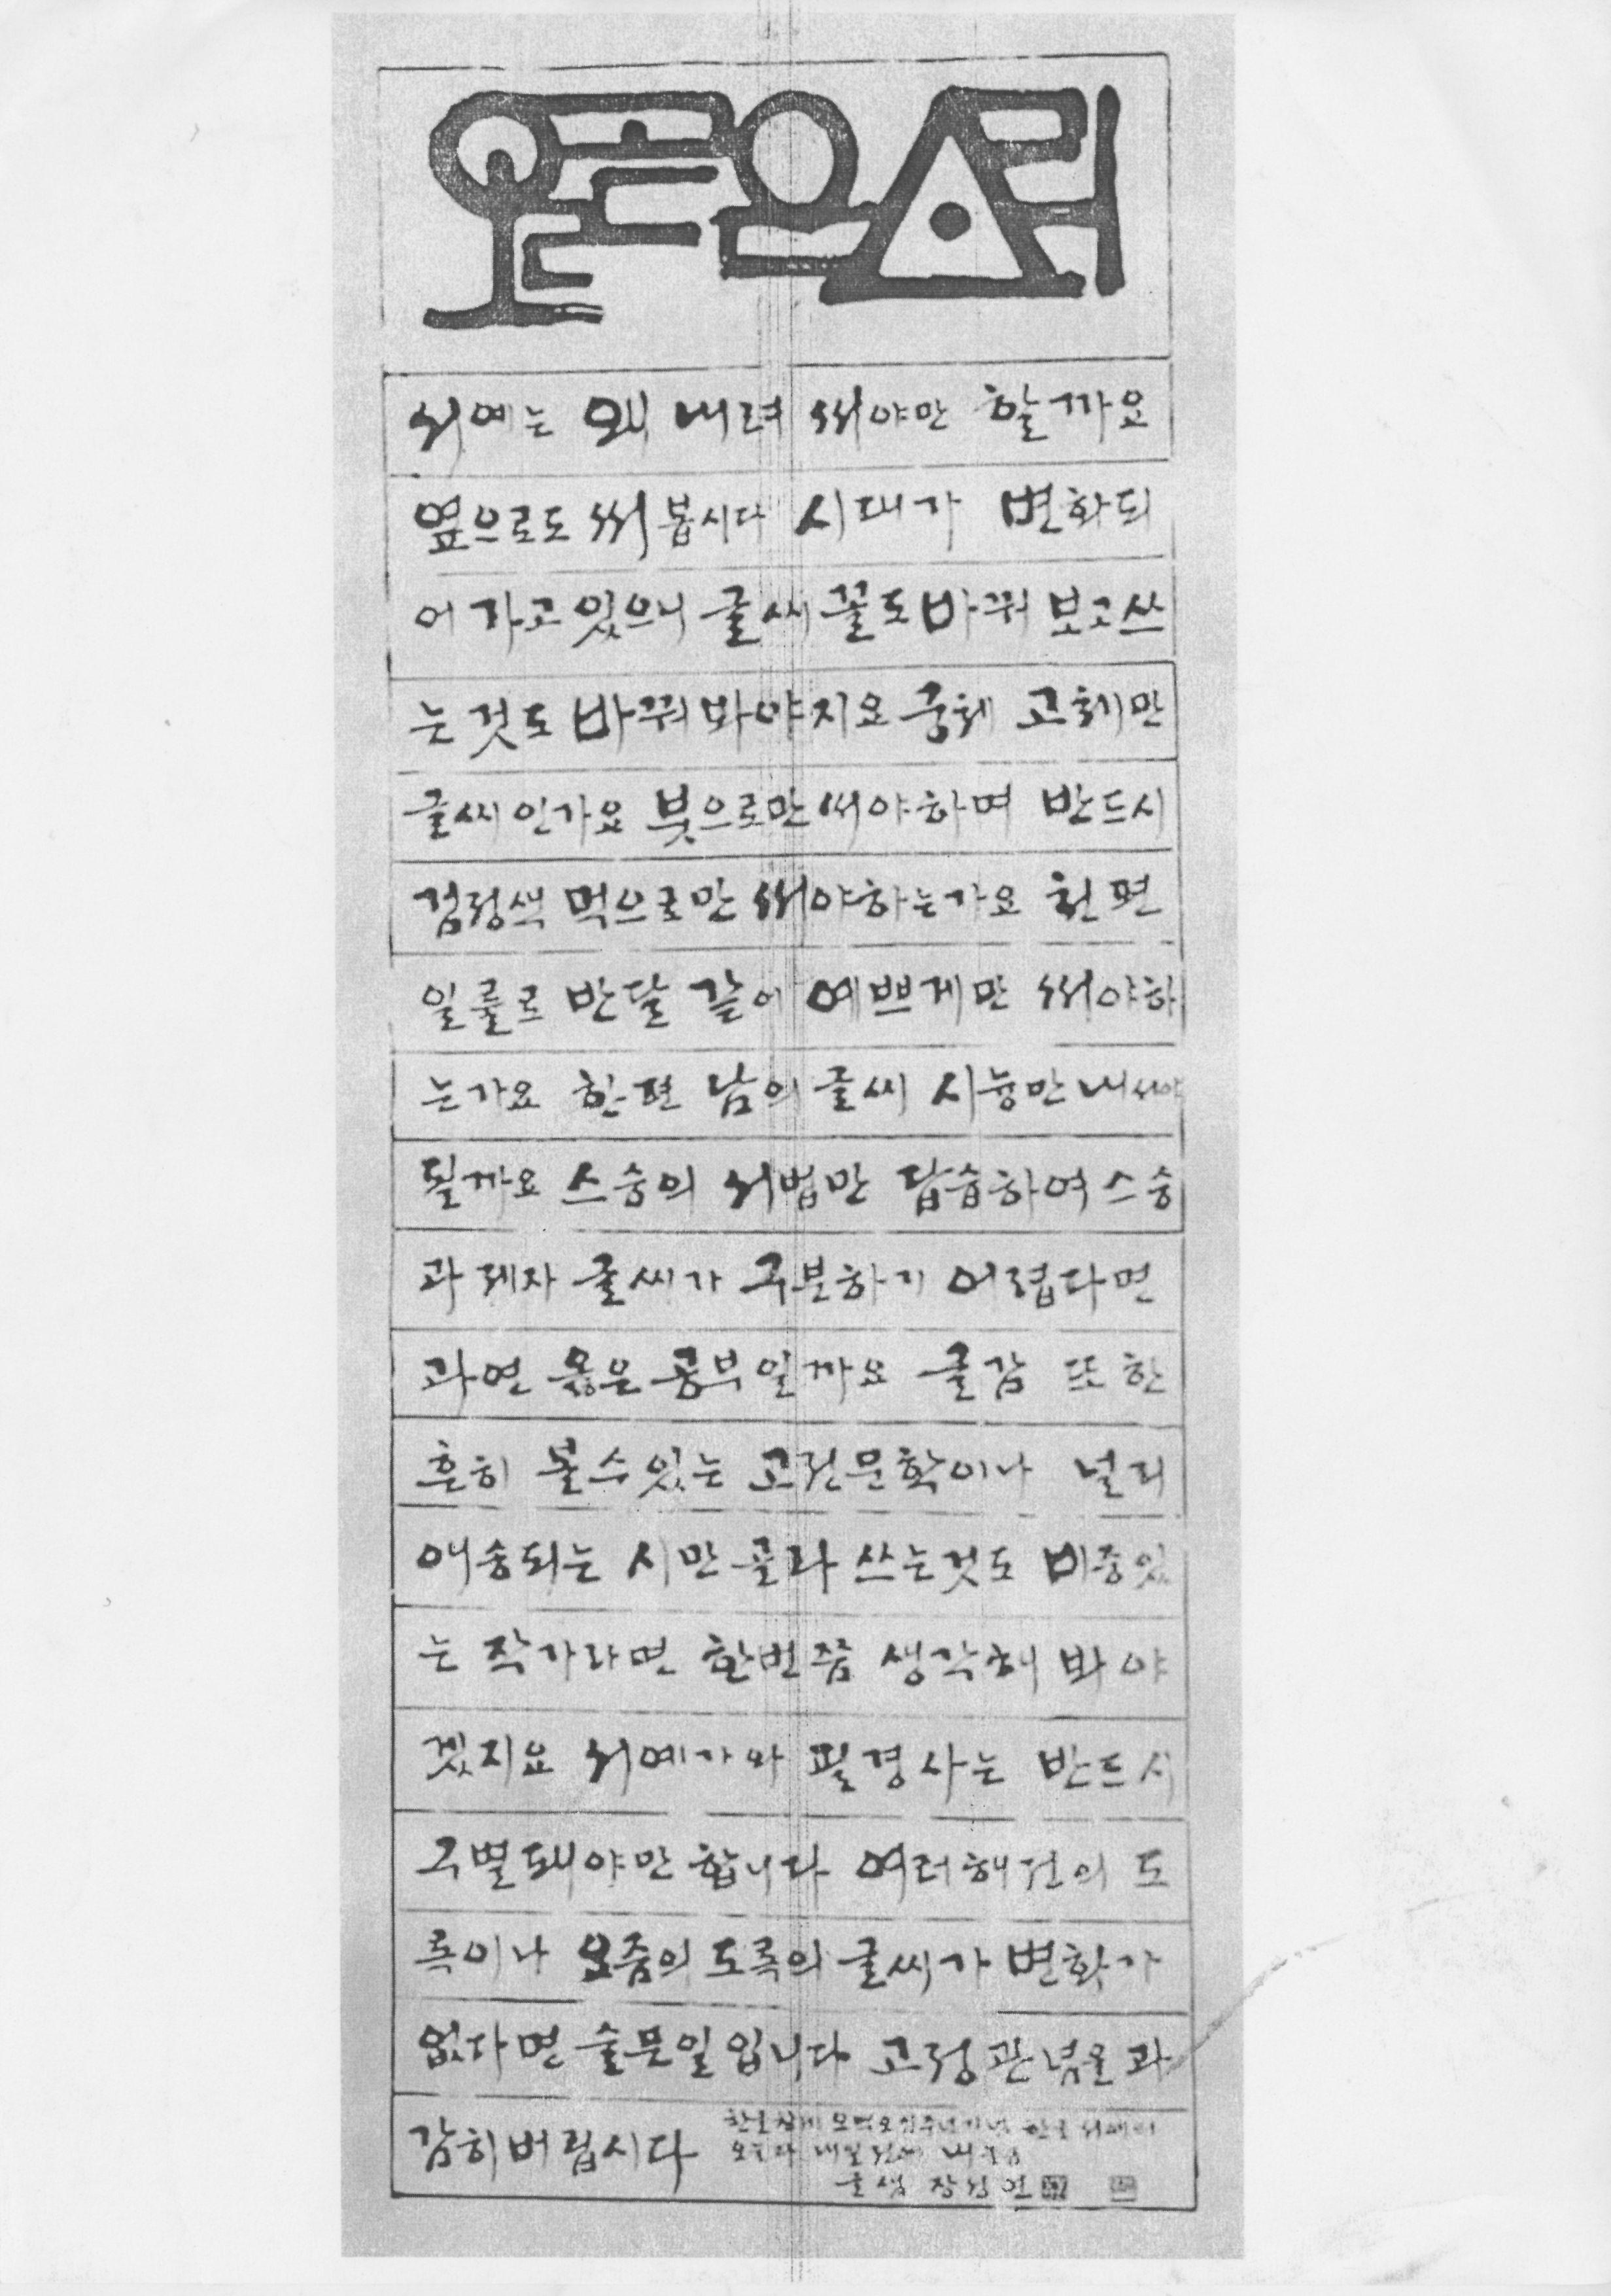 t115B r1 석정아 03/ 장성연 쓴 서간체 한글묵장보감, 이화문화출판사